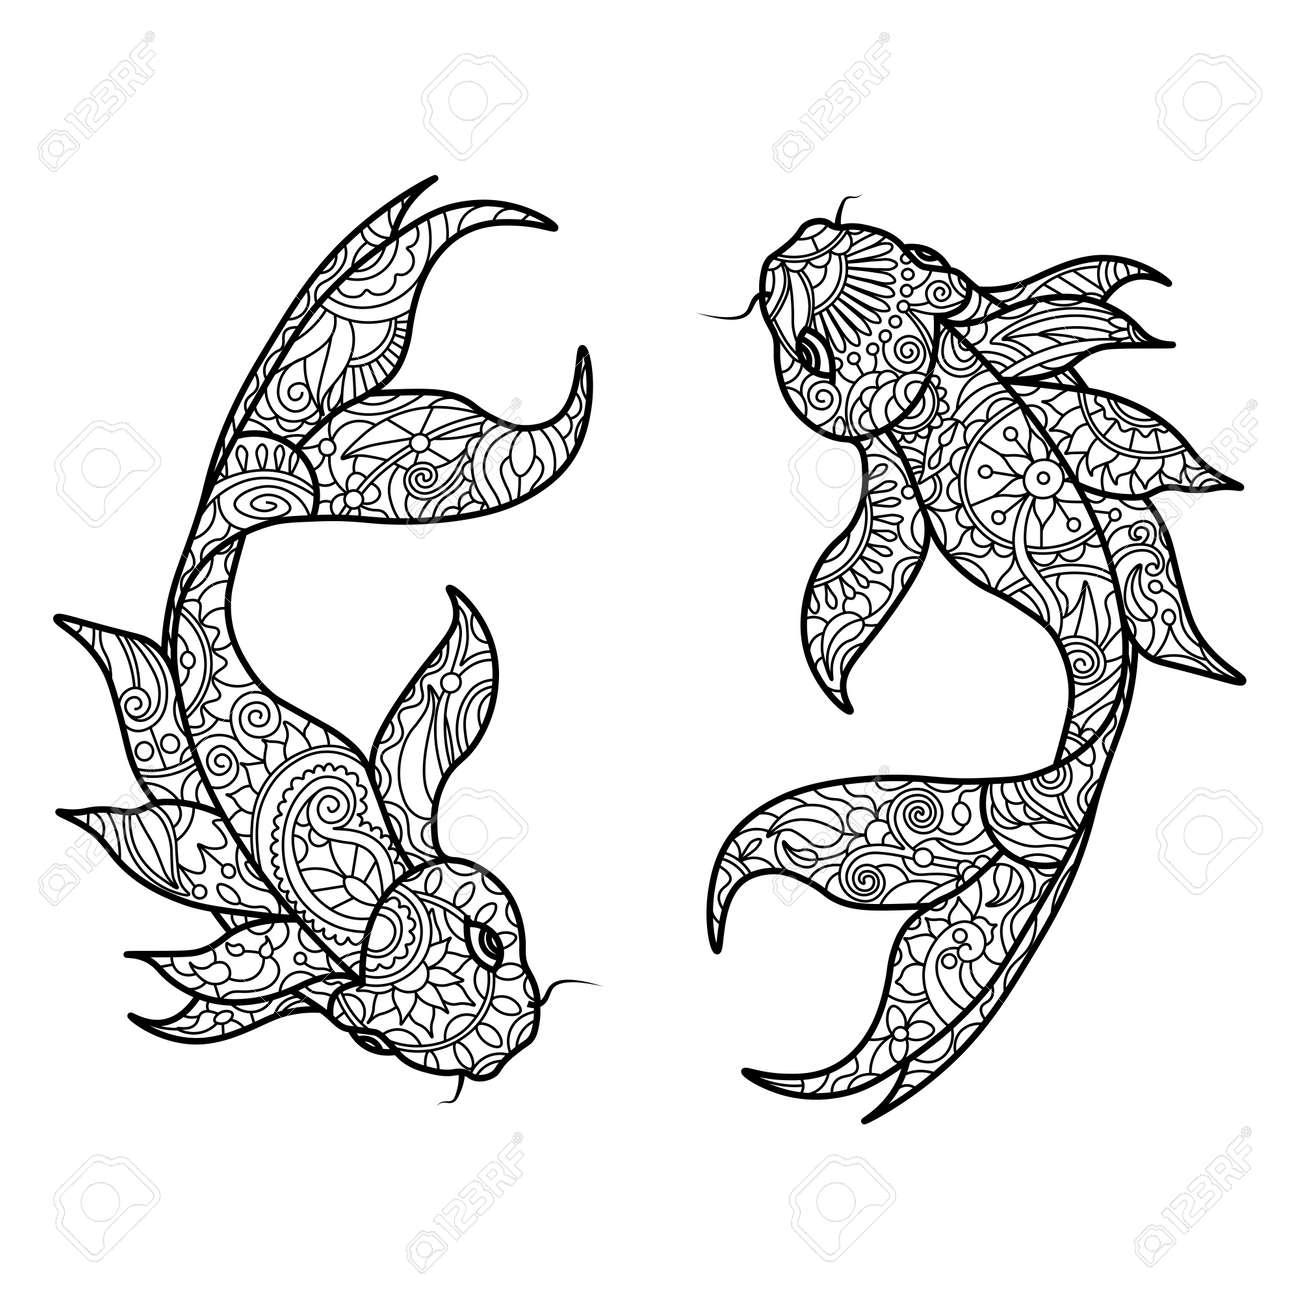 Koi Carp Fish Coloring Book For Adults Vector Illustration. Anti ...